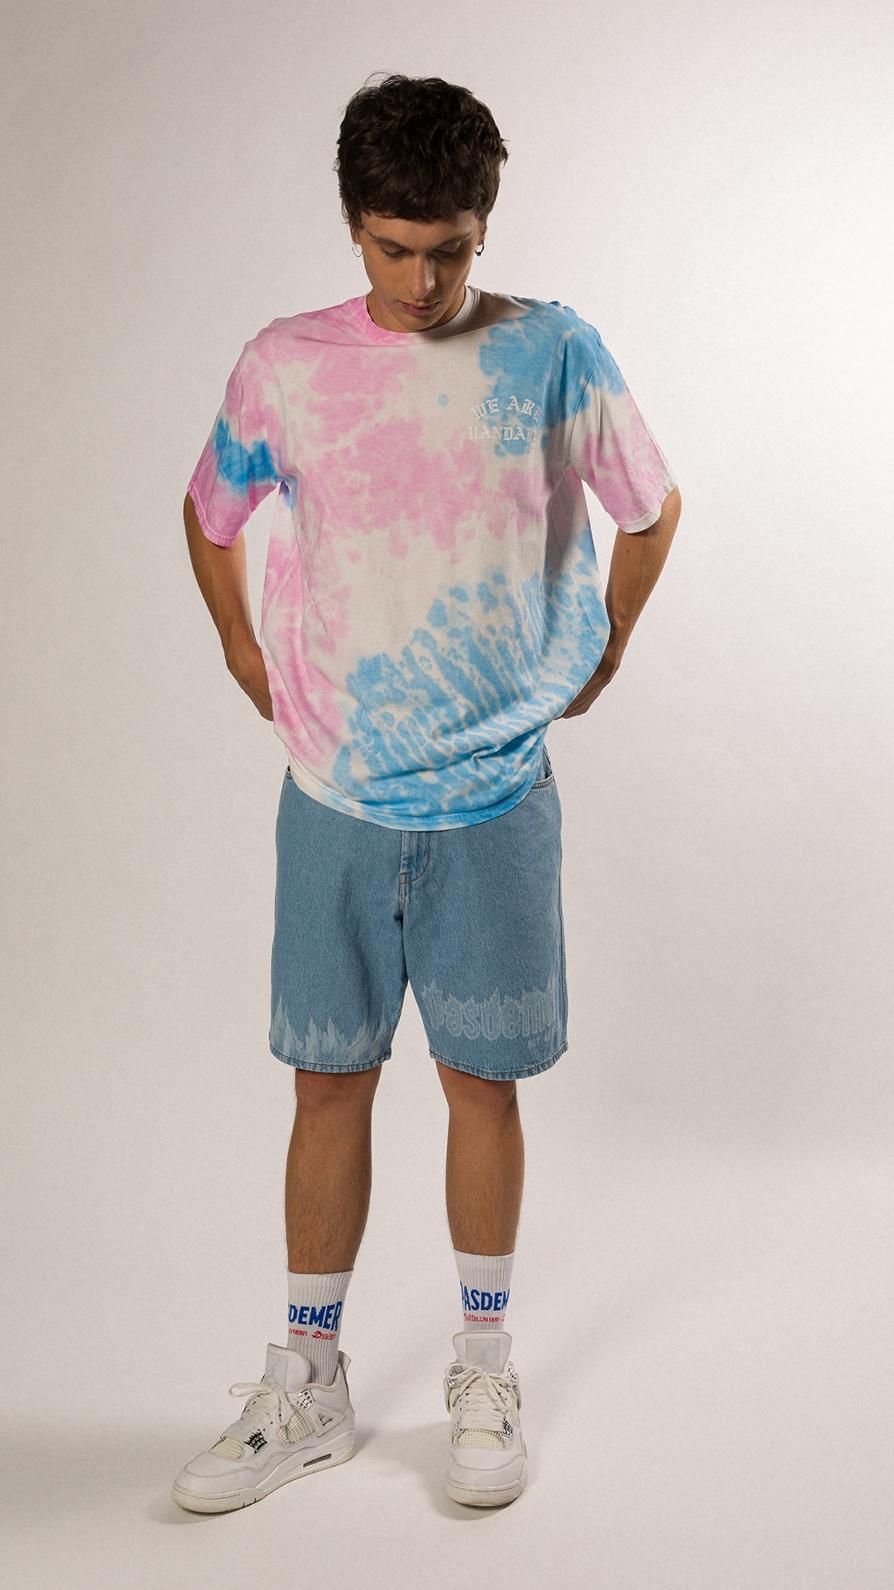 【PAS DE MER/パドゥメ】WAV TIE DYE  T-SHIRT Tシャツ / PATTERN